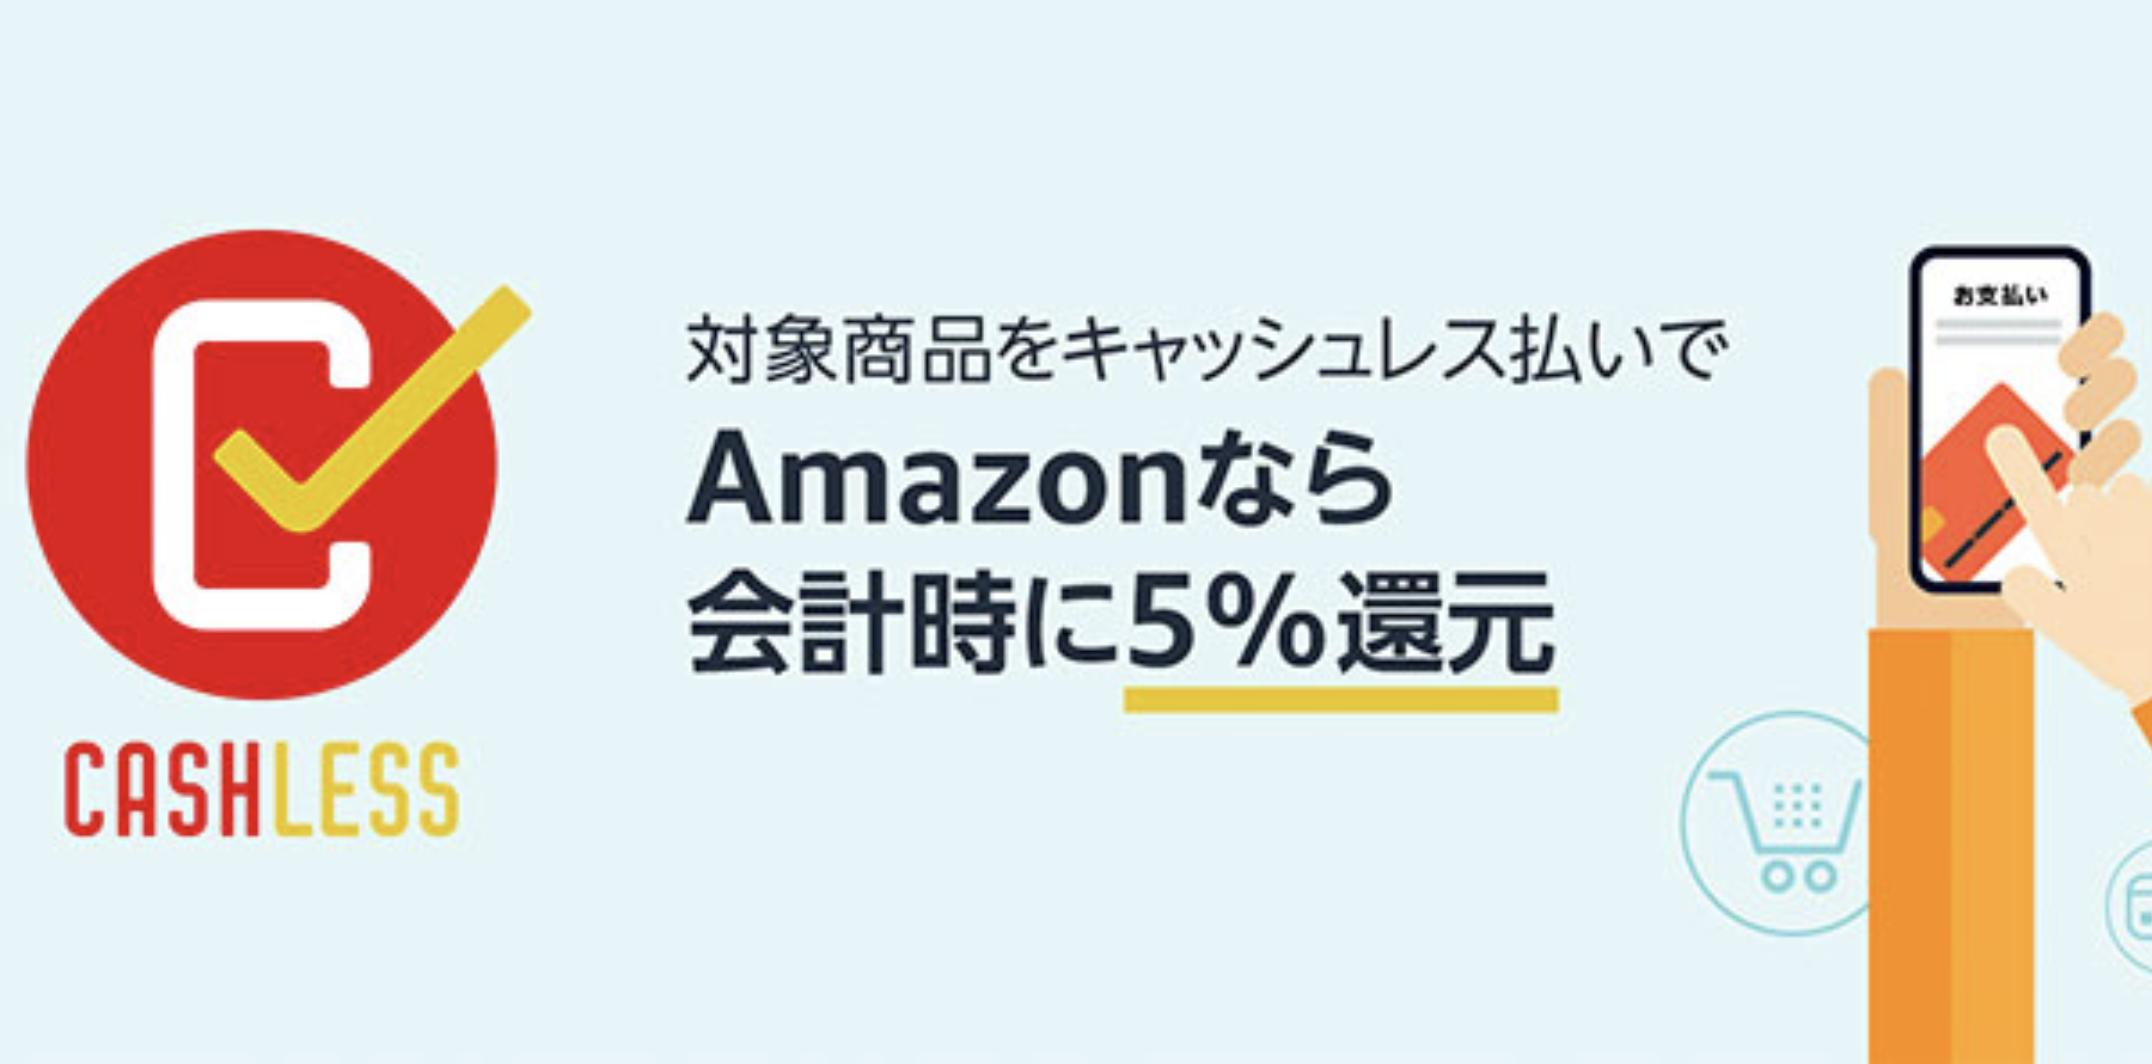 Amazonキャッシュレス決済割引